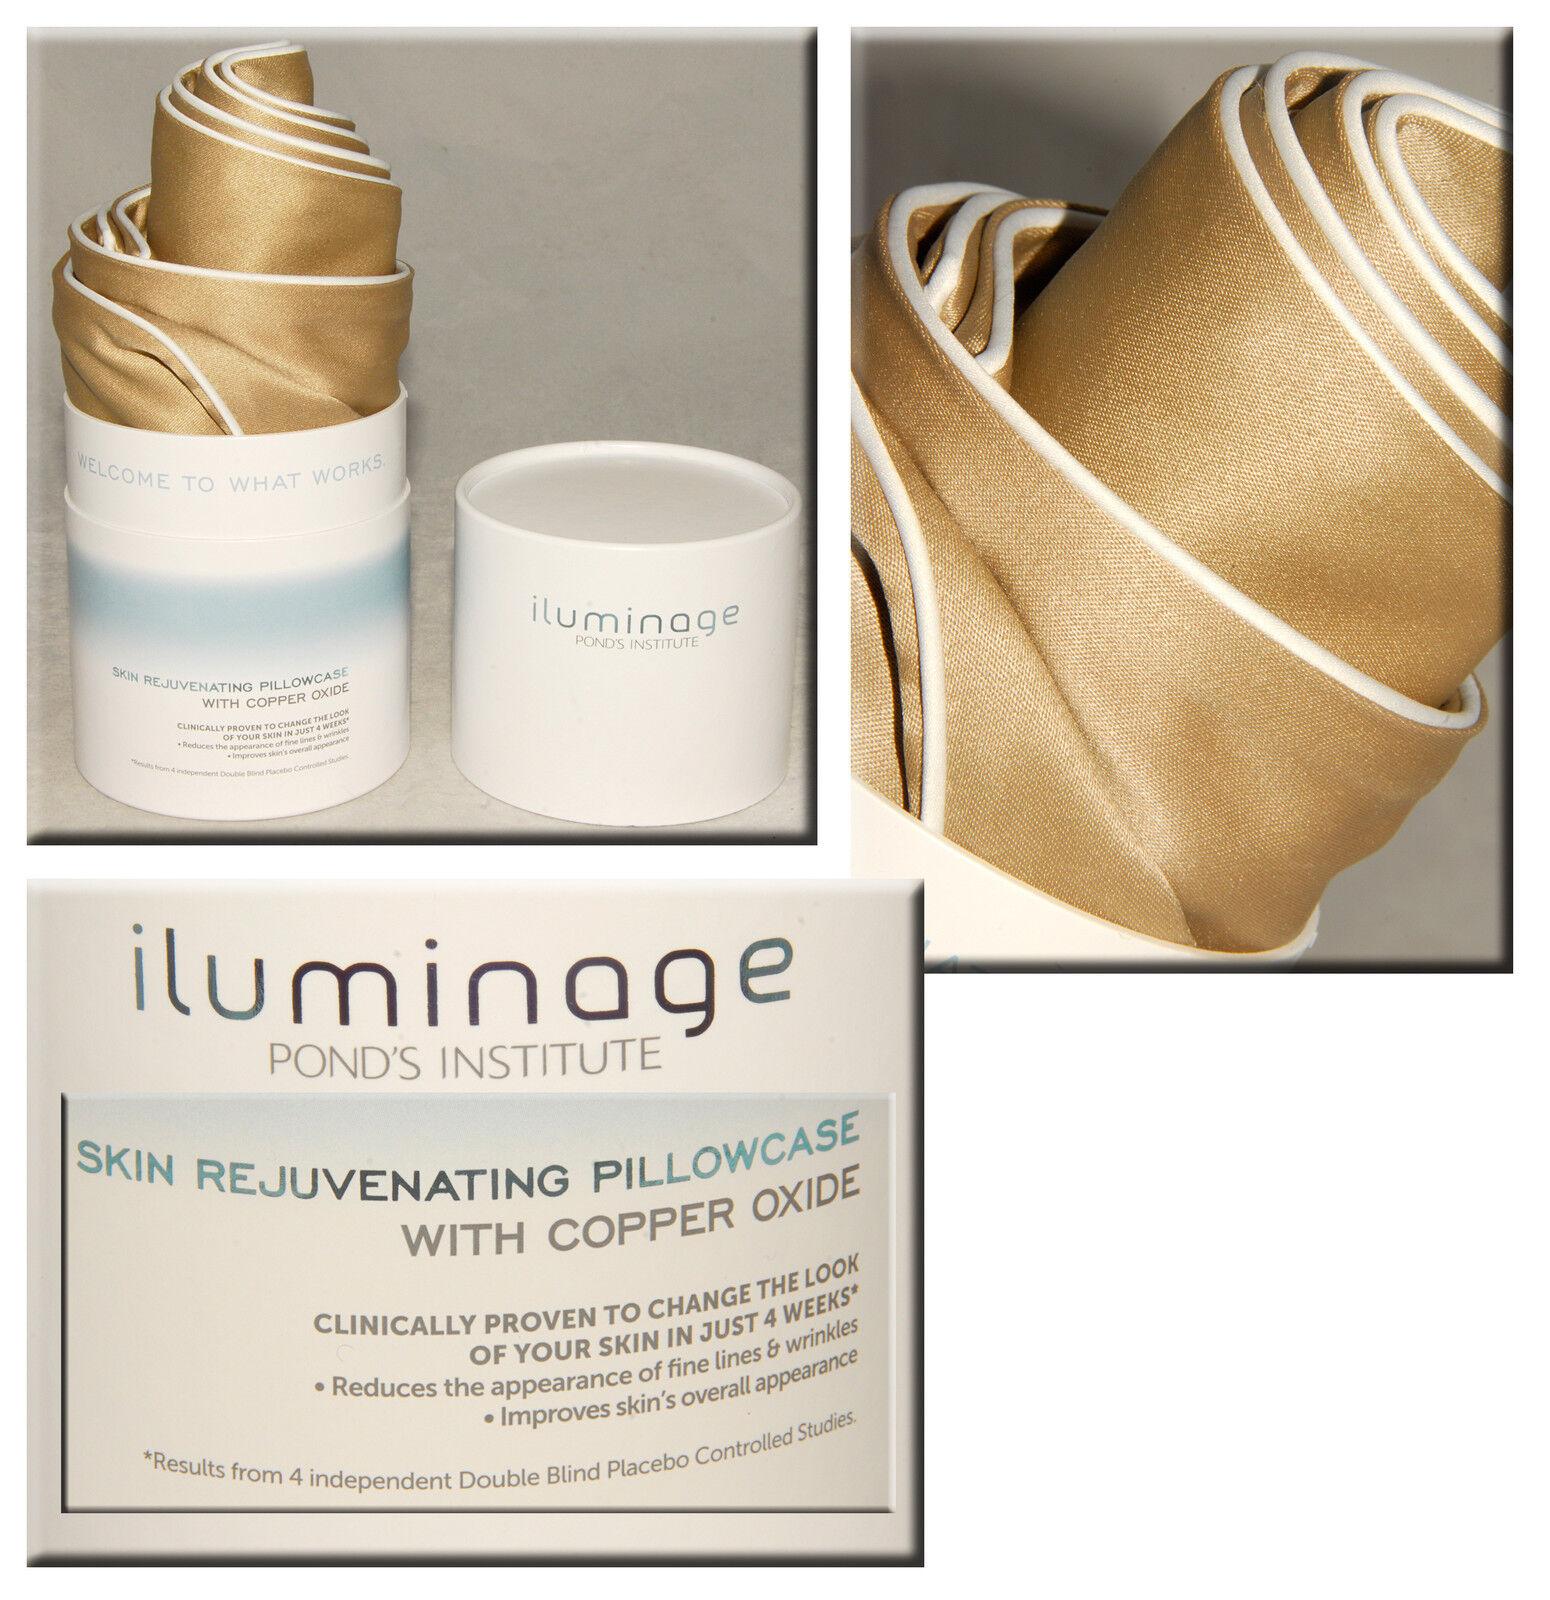 Iluminage - LUXURIOUS Skin Rejuvenating PILLOWCASE w  COPPER OXIDE King Größe NEW